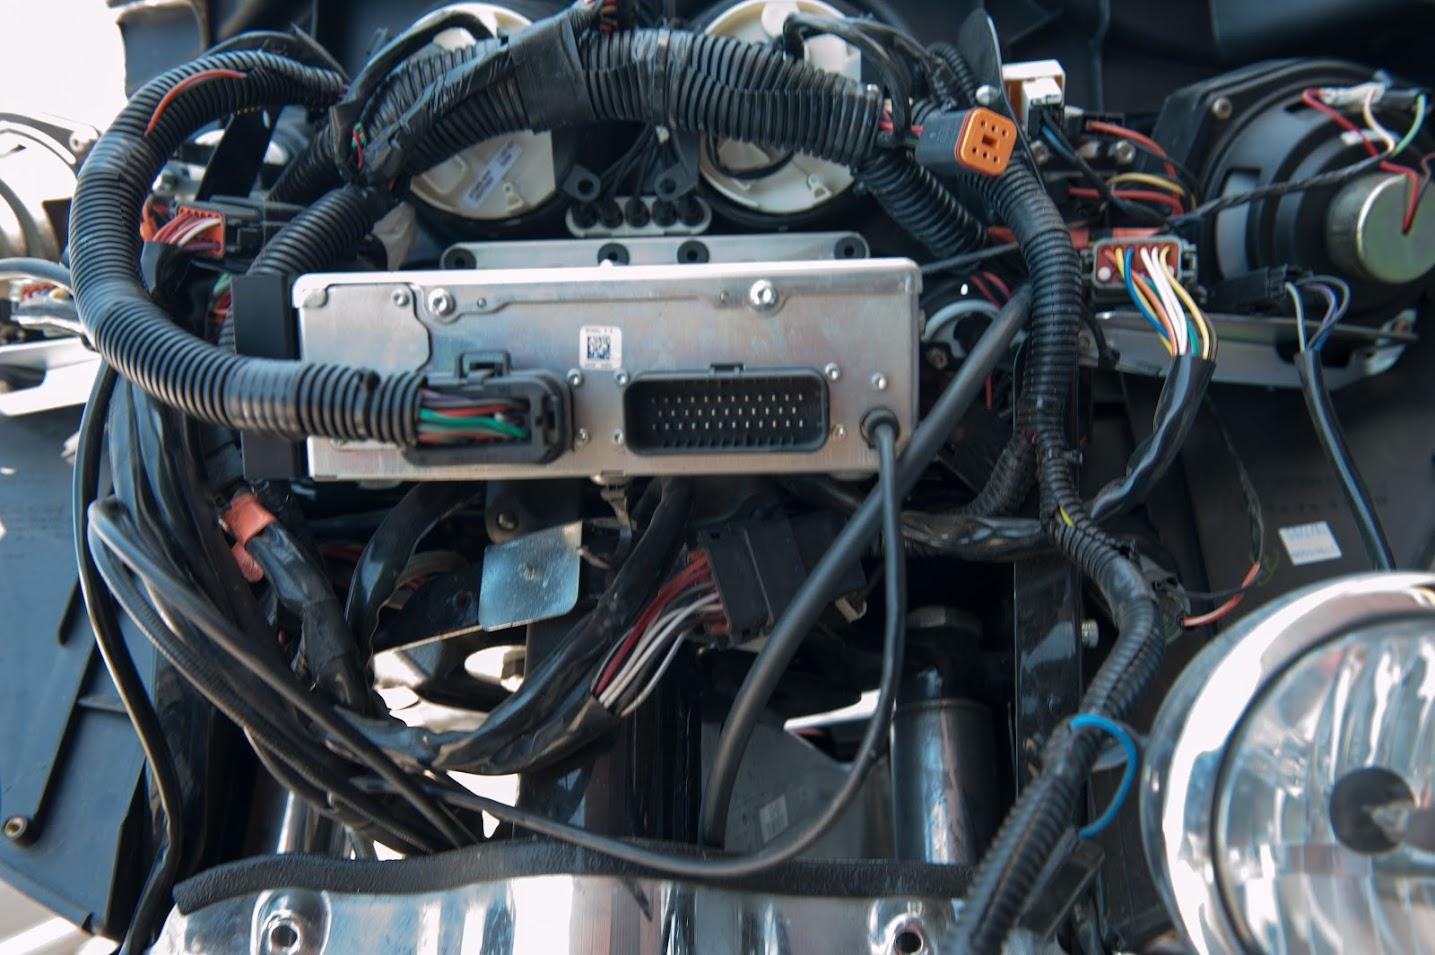 5ai6BkJfAMz9PbZoGvzJJ7kG0xyEmUUsU81qbrzWUSX1=w1435-h955-no Harley Inner Fairing Wiring Harness on